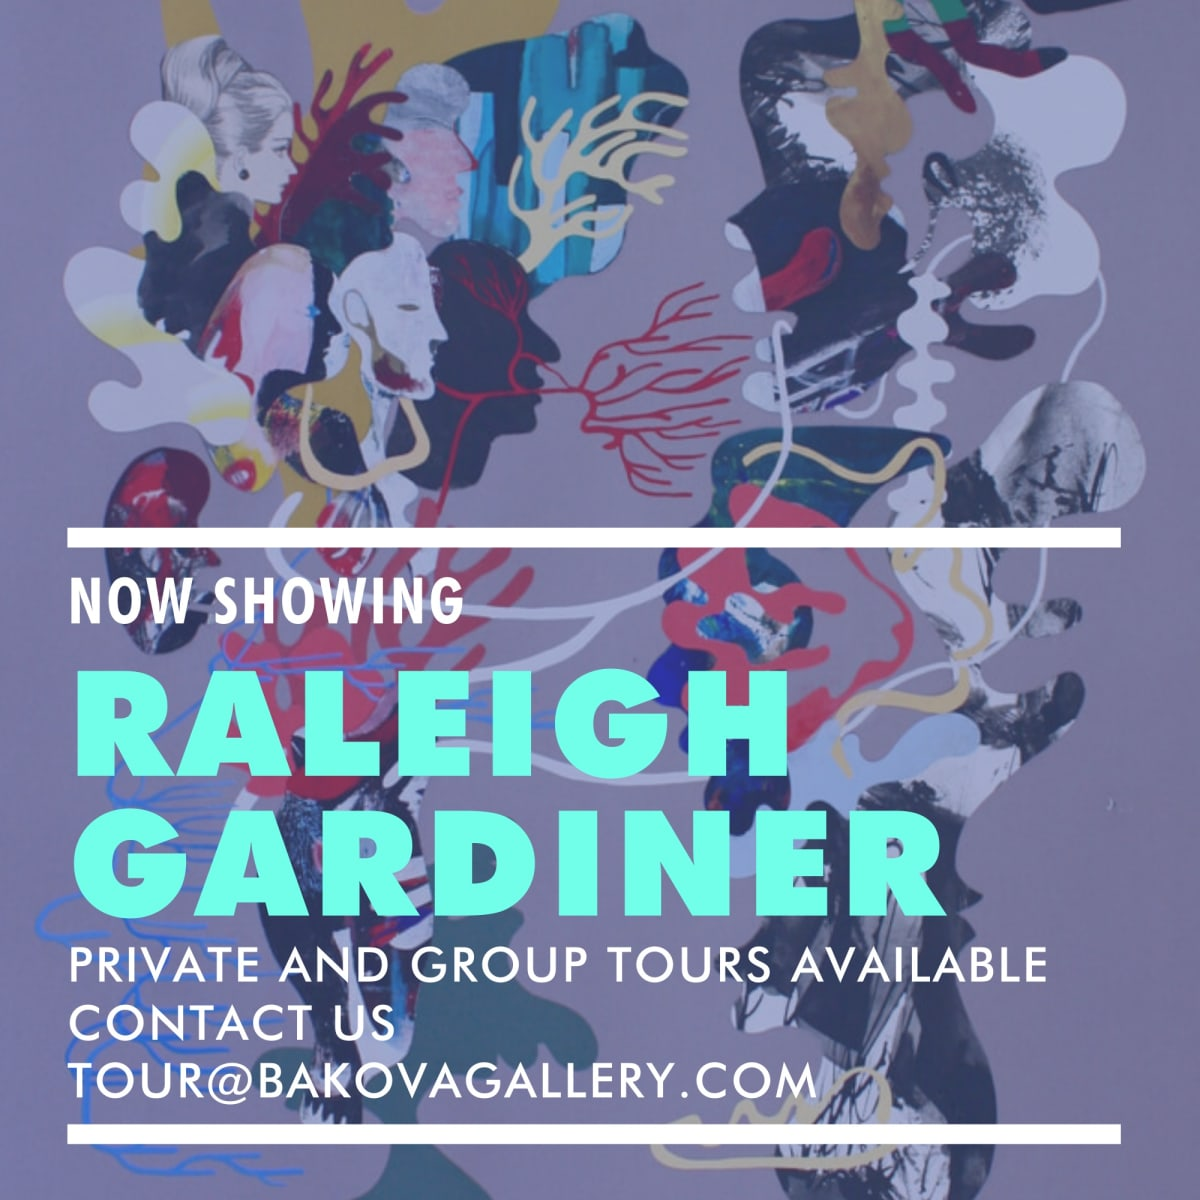 Raleigh Gardiner